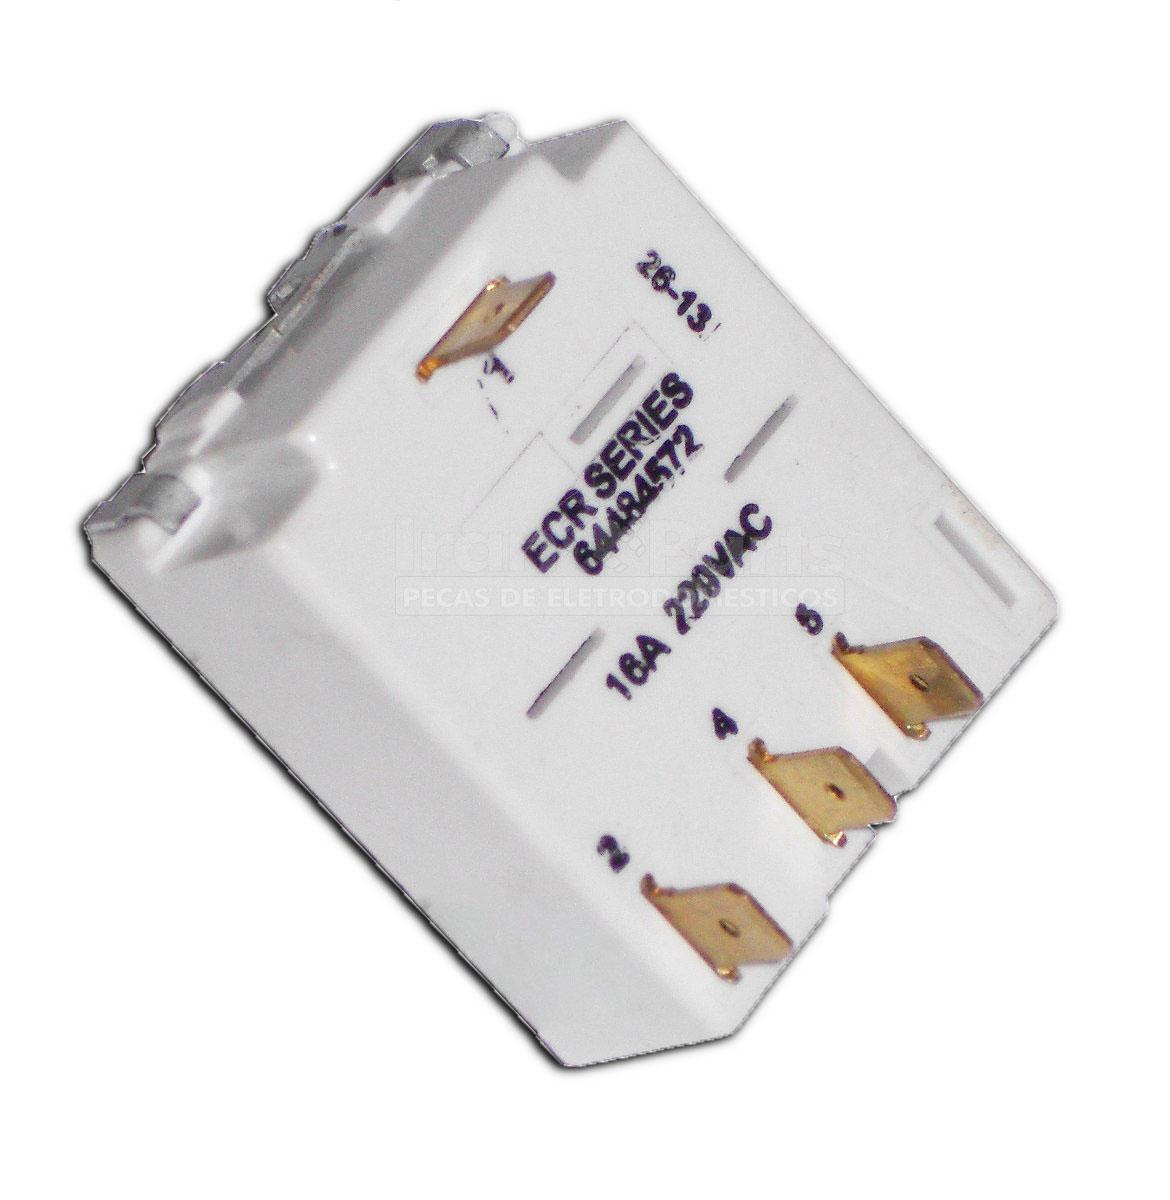 Chave Seletora 5 Posições  Electrolux 64484572